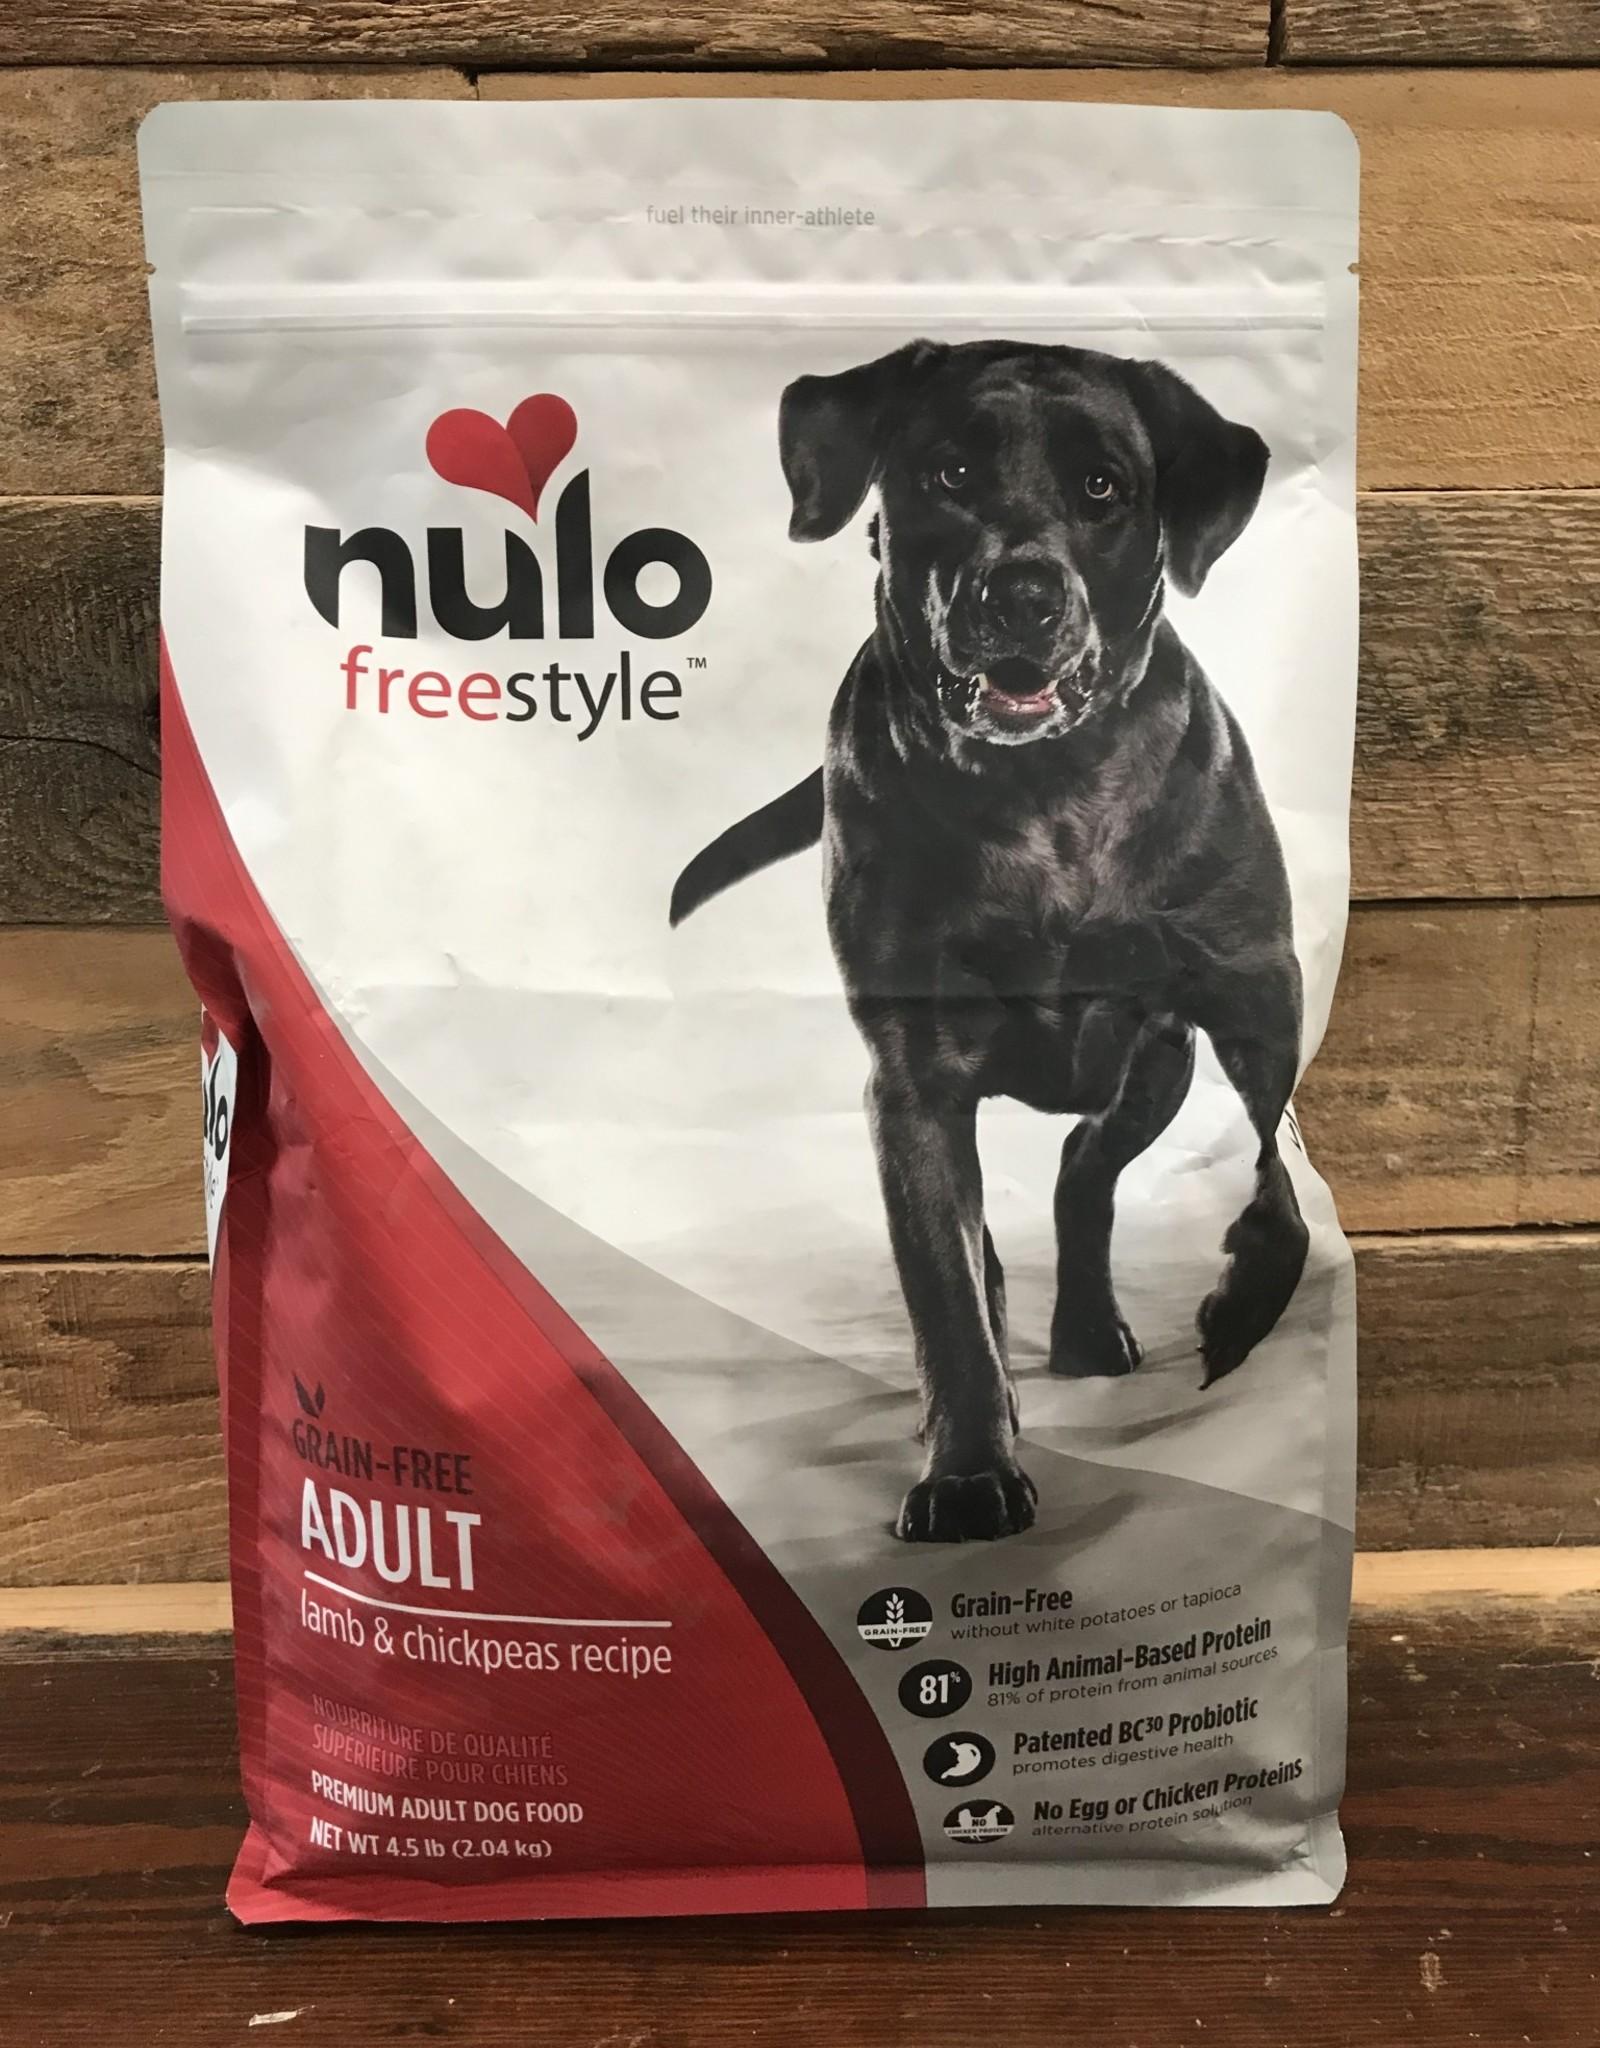 Nulo FreeStyle 4.5# Grain Free Adult Lamb & Chickpeas